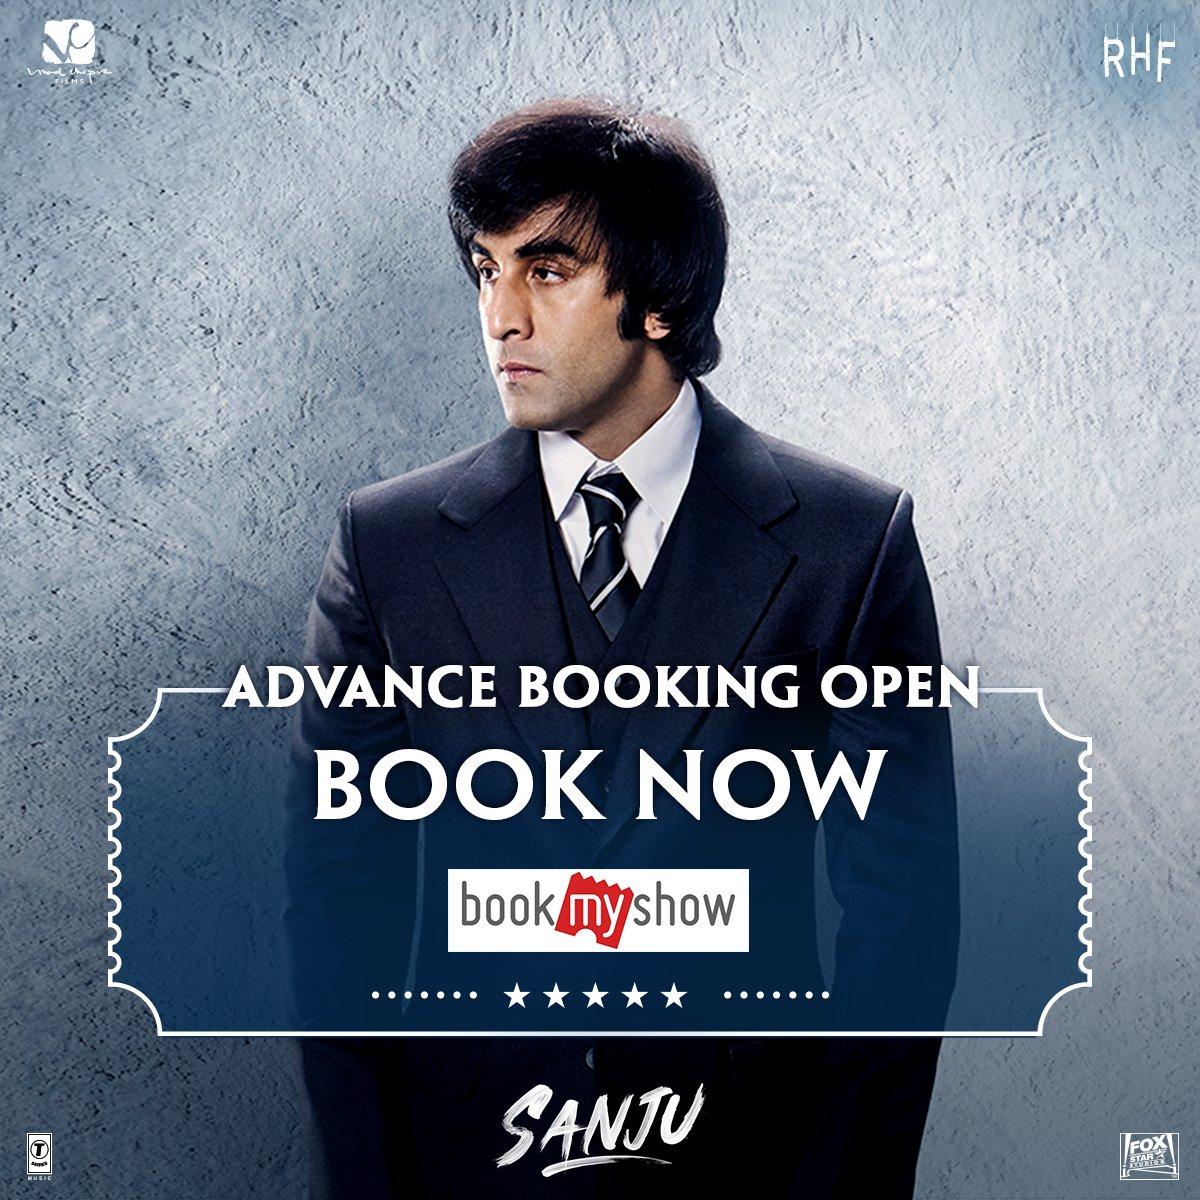 Bole toh, theatres full ho gaya hain! Book your tickets in advance for #Sanju on  https:// bookmy.show/SanjuFilm  &nbsp;    #RanbirKapoor @RajkumarHirani @VVCFilms @bookmyshow #RajkumarHiraniFilms<br>http://pic.twitter.com/oIYptQfspy